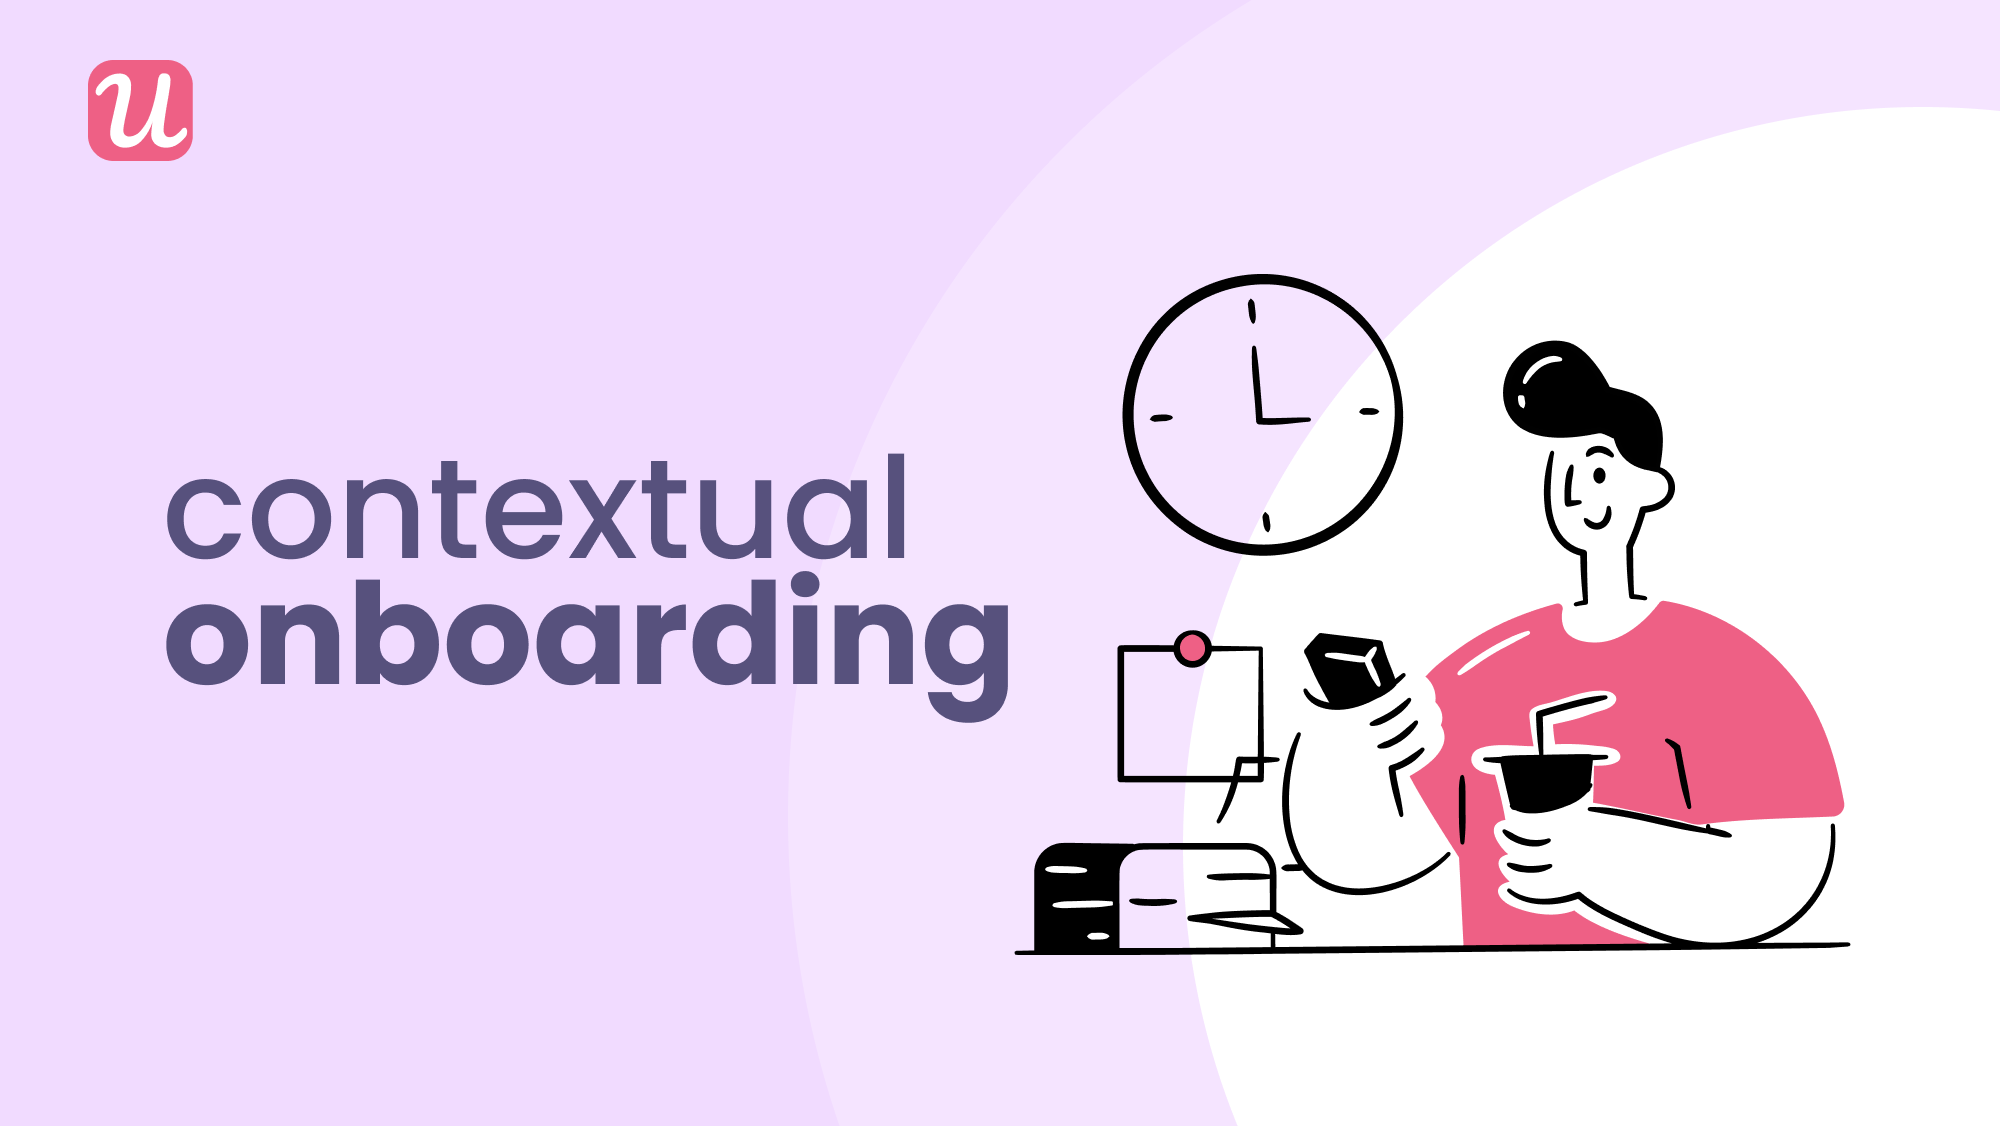 contextual onboarding